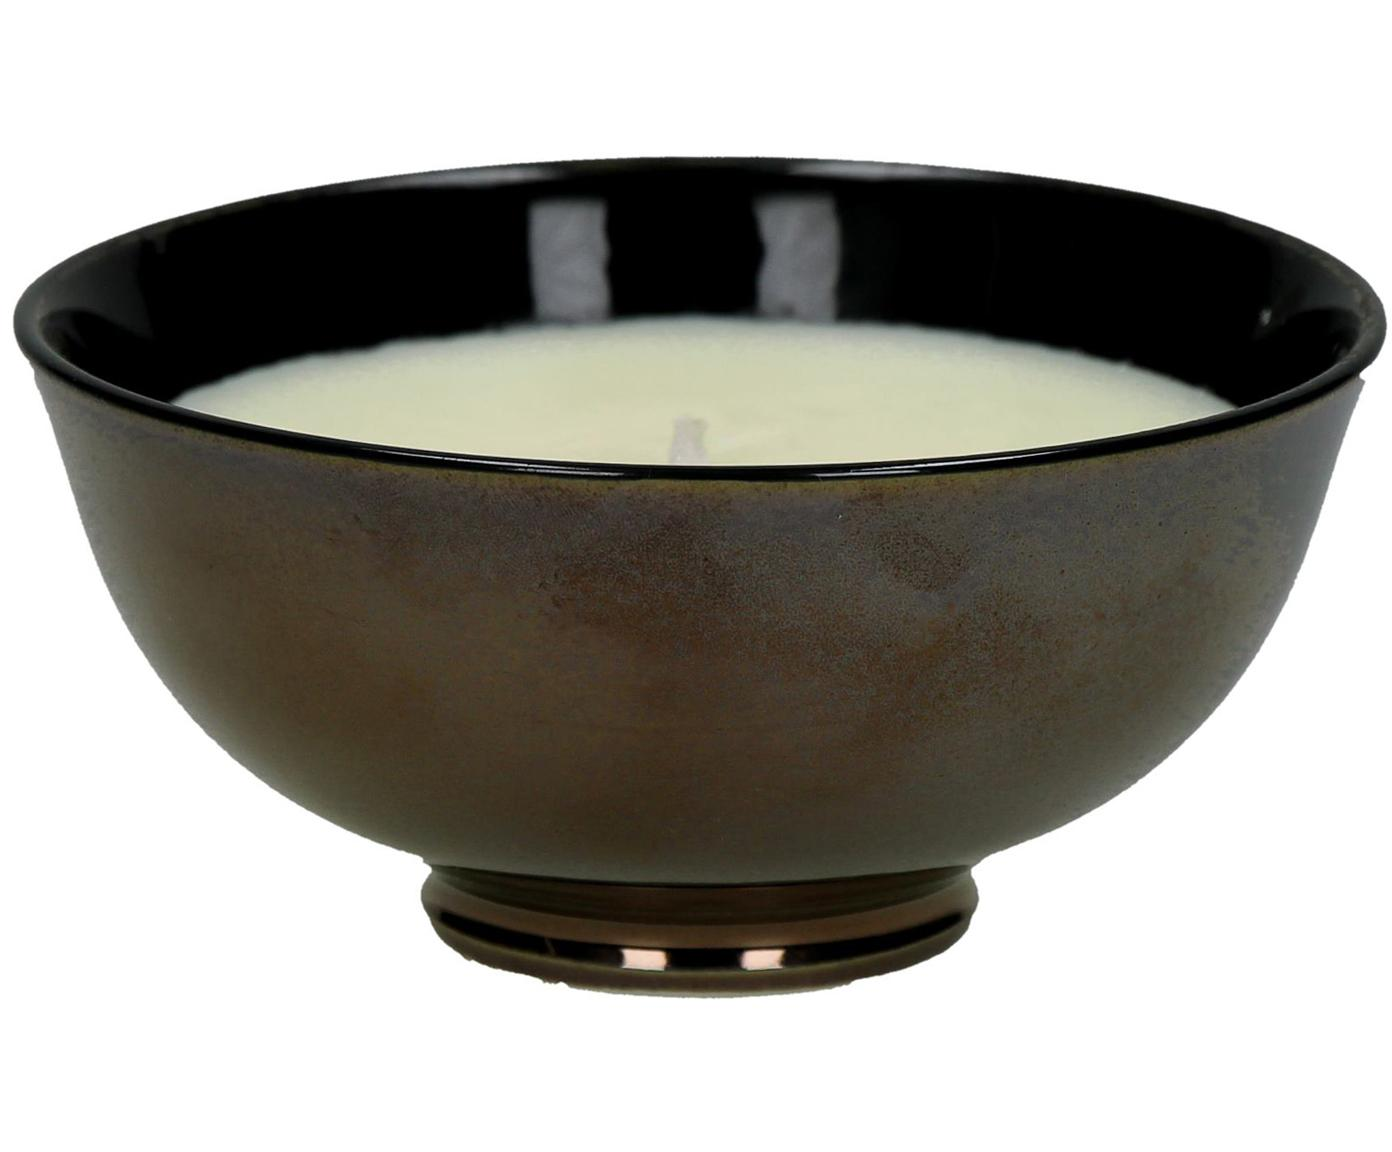 Duftkerze Black Yasmin (Jasmin), Behälter: Porzellan, Behälter: BraunKerze: Weiß, Ø 12 x H 6 cm